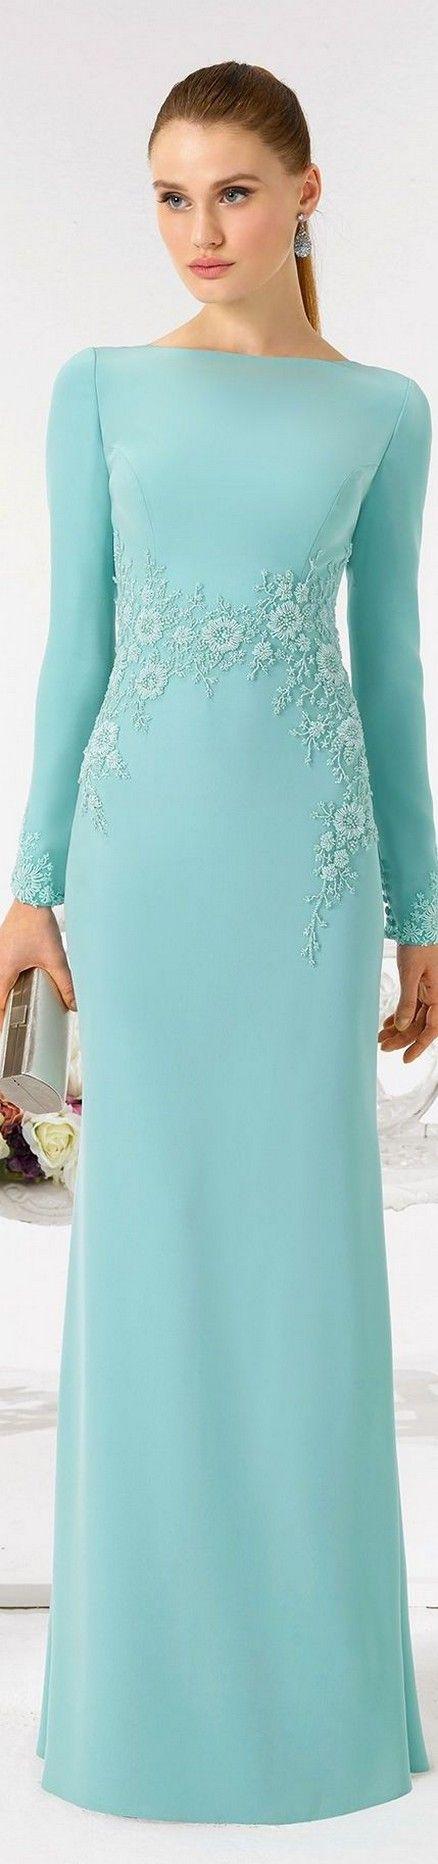 Mejores 641 imágenes de Event Dresses en Pinterest   Vestidos de ...